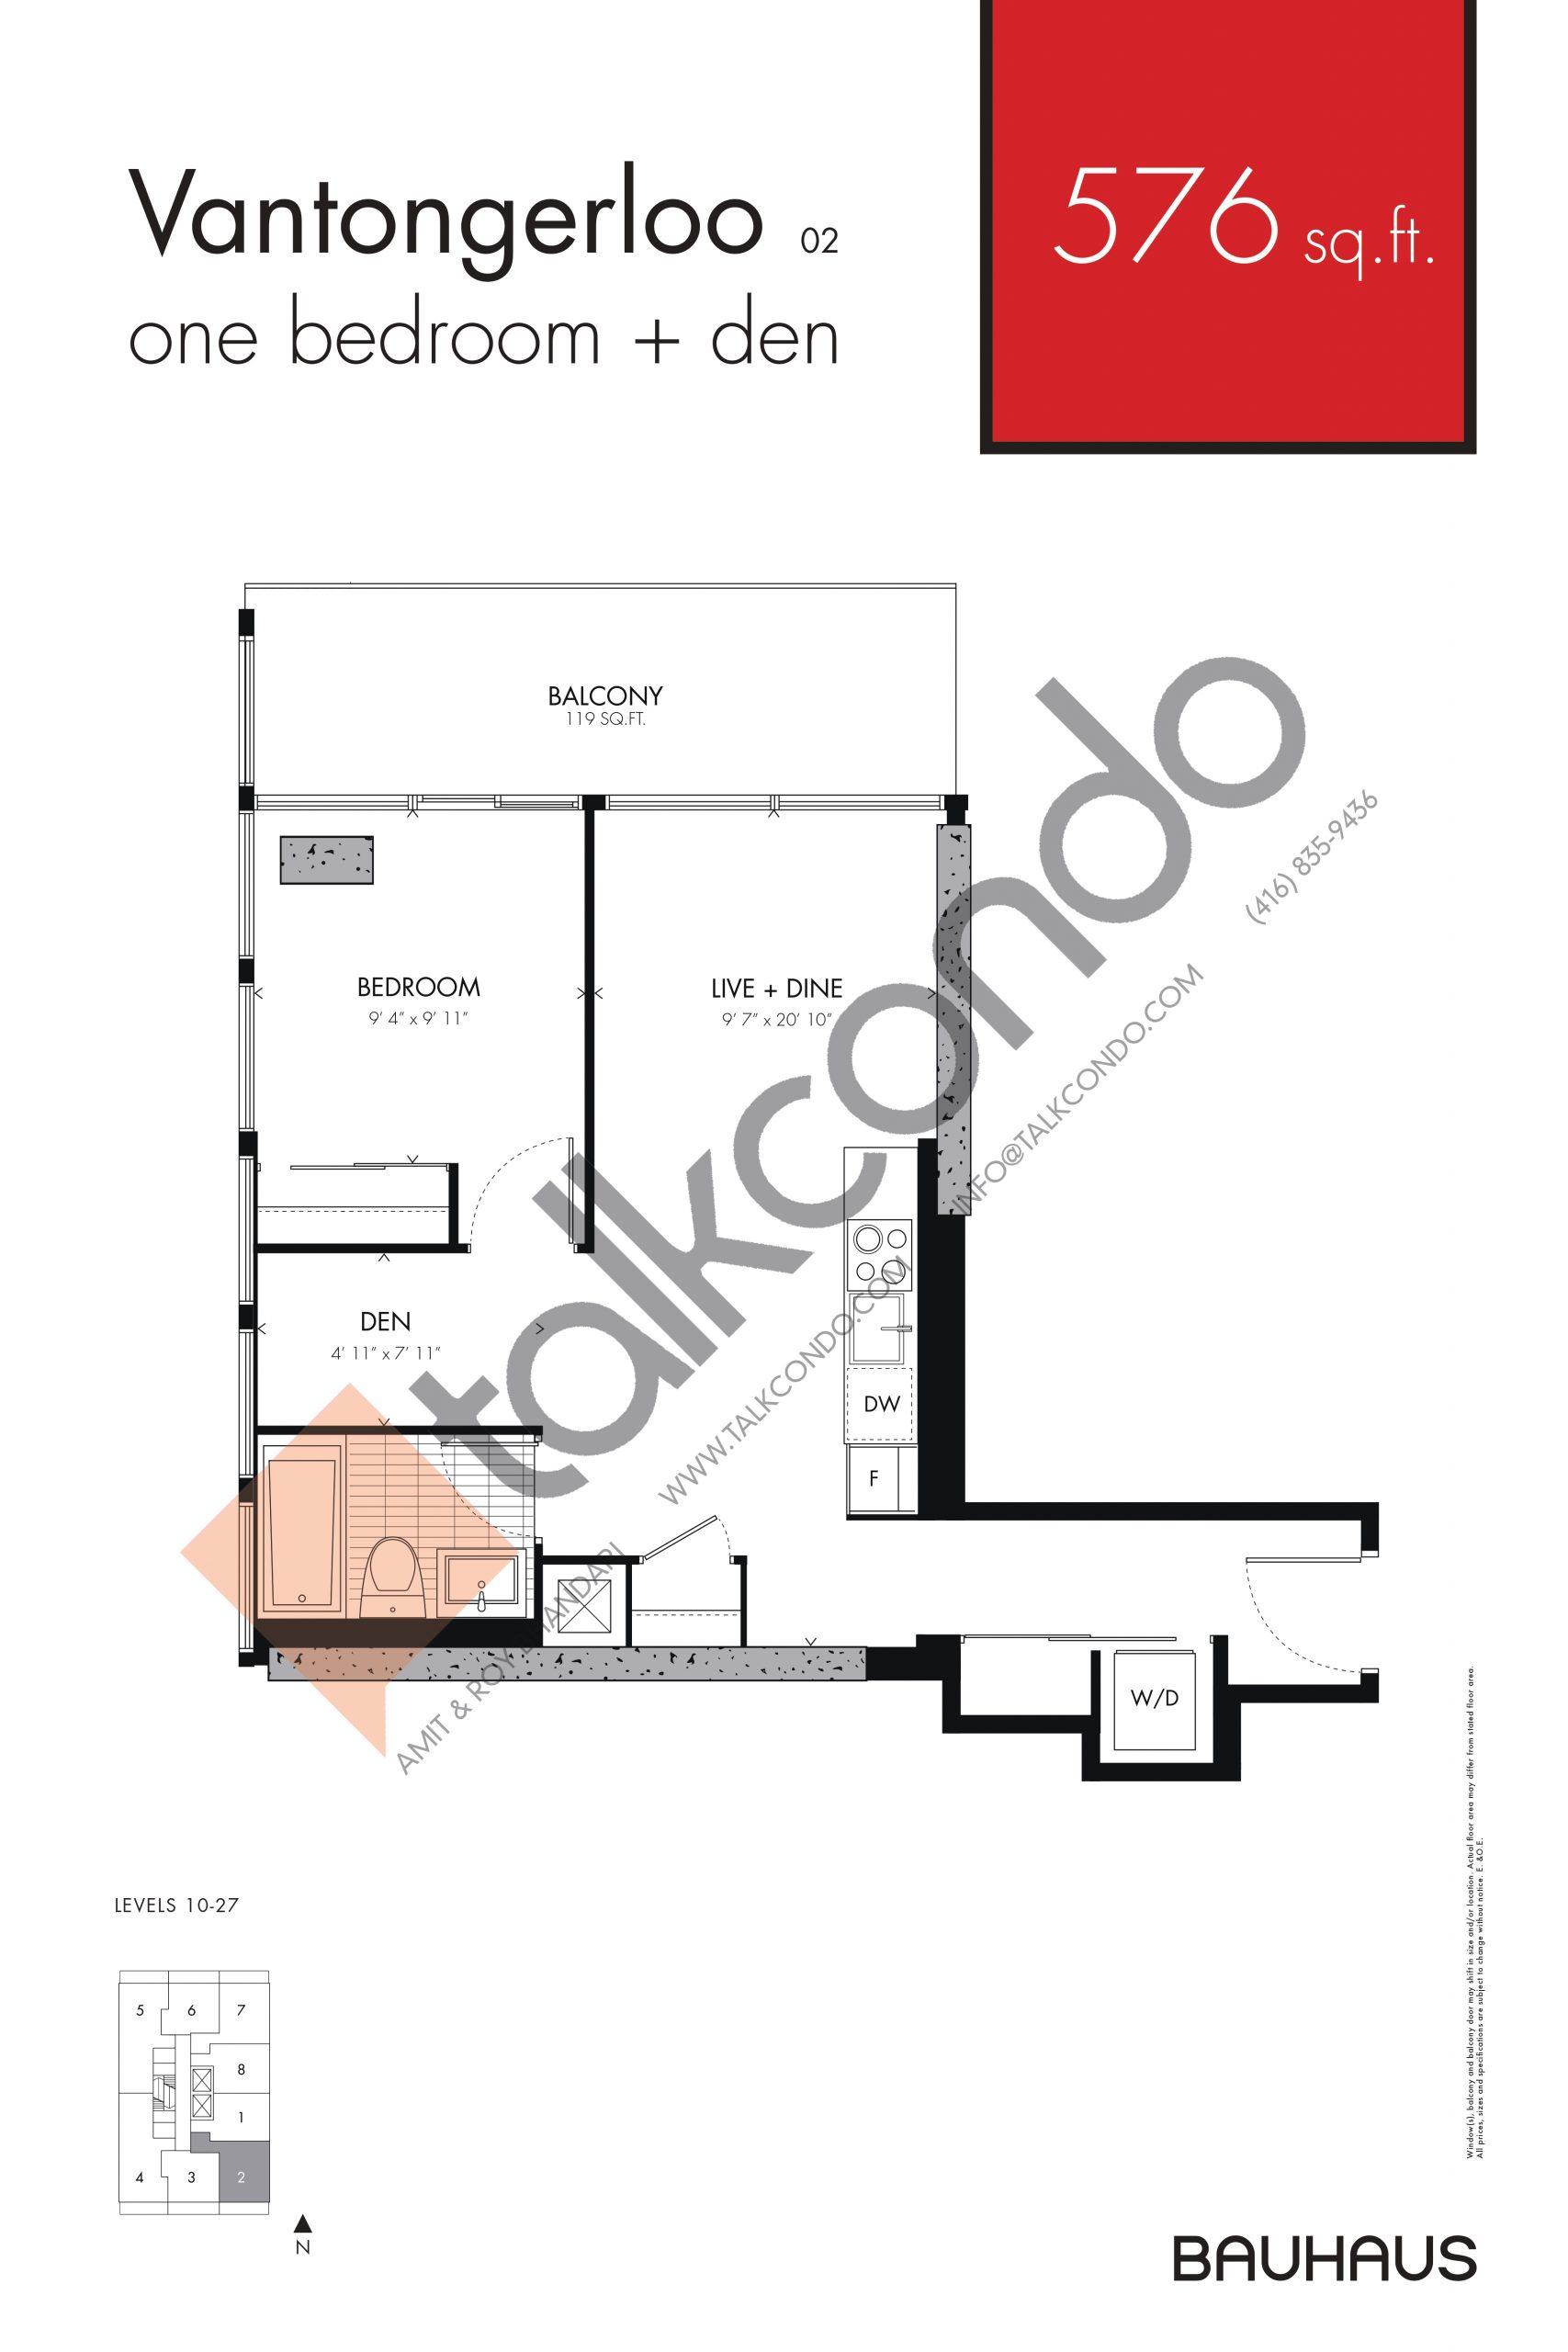 Vantongerloo Floor Plan at Bauhaus Condos - 576 sq.ft